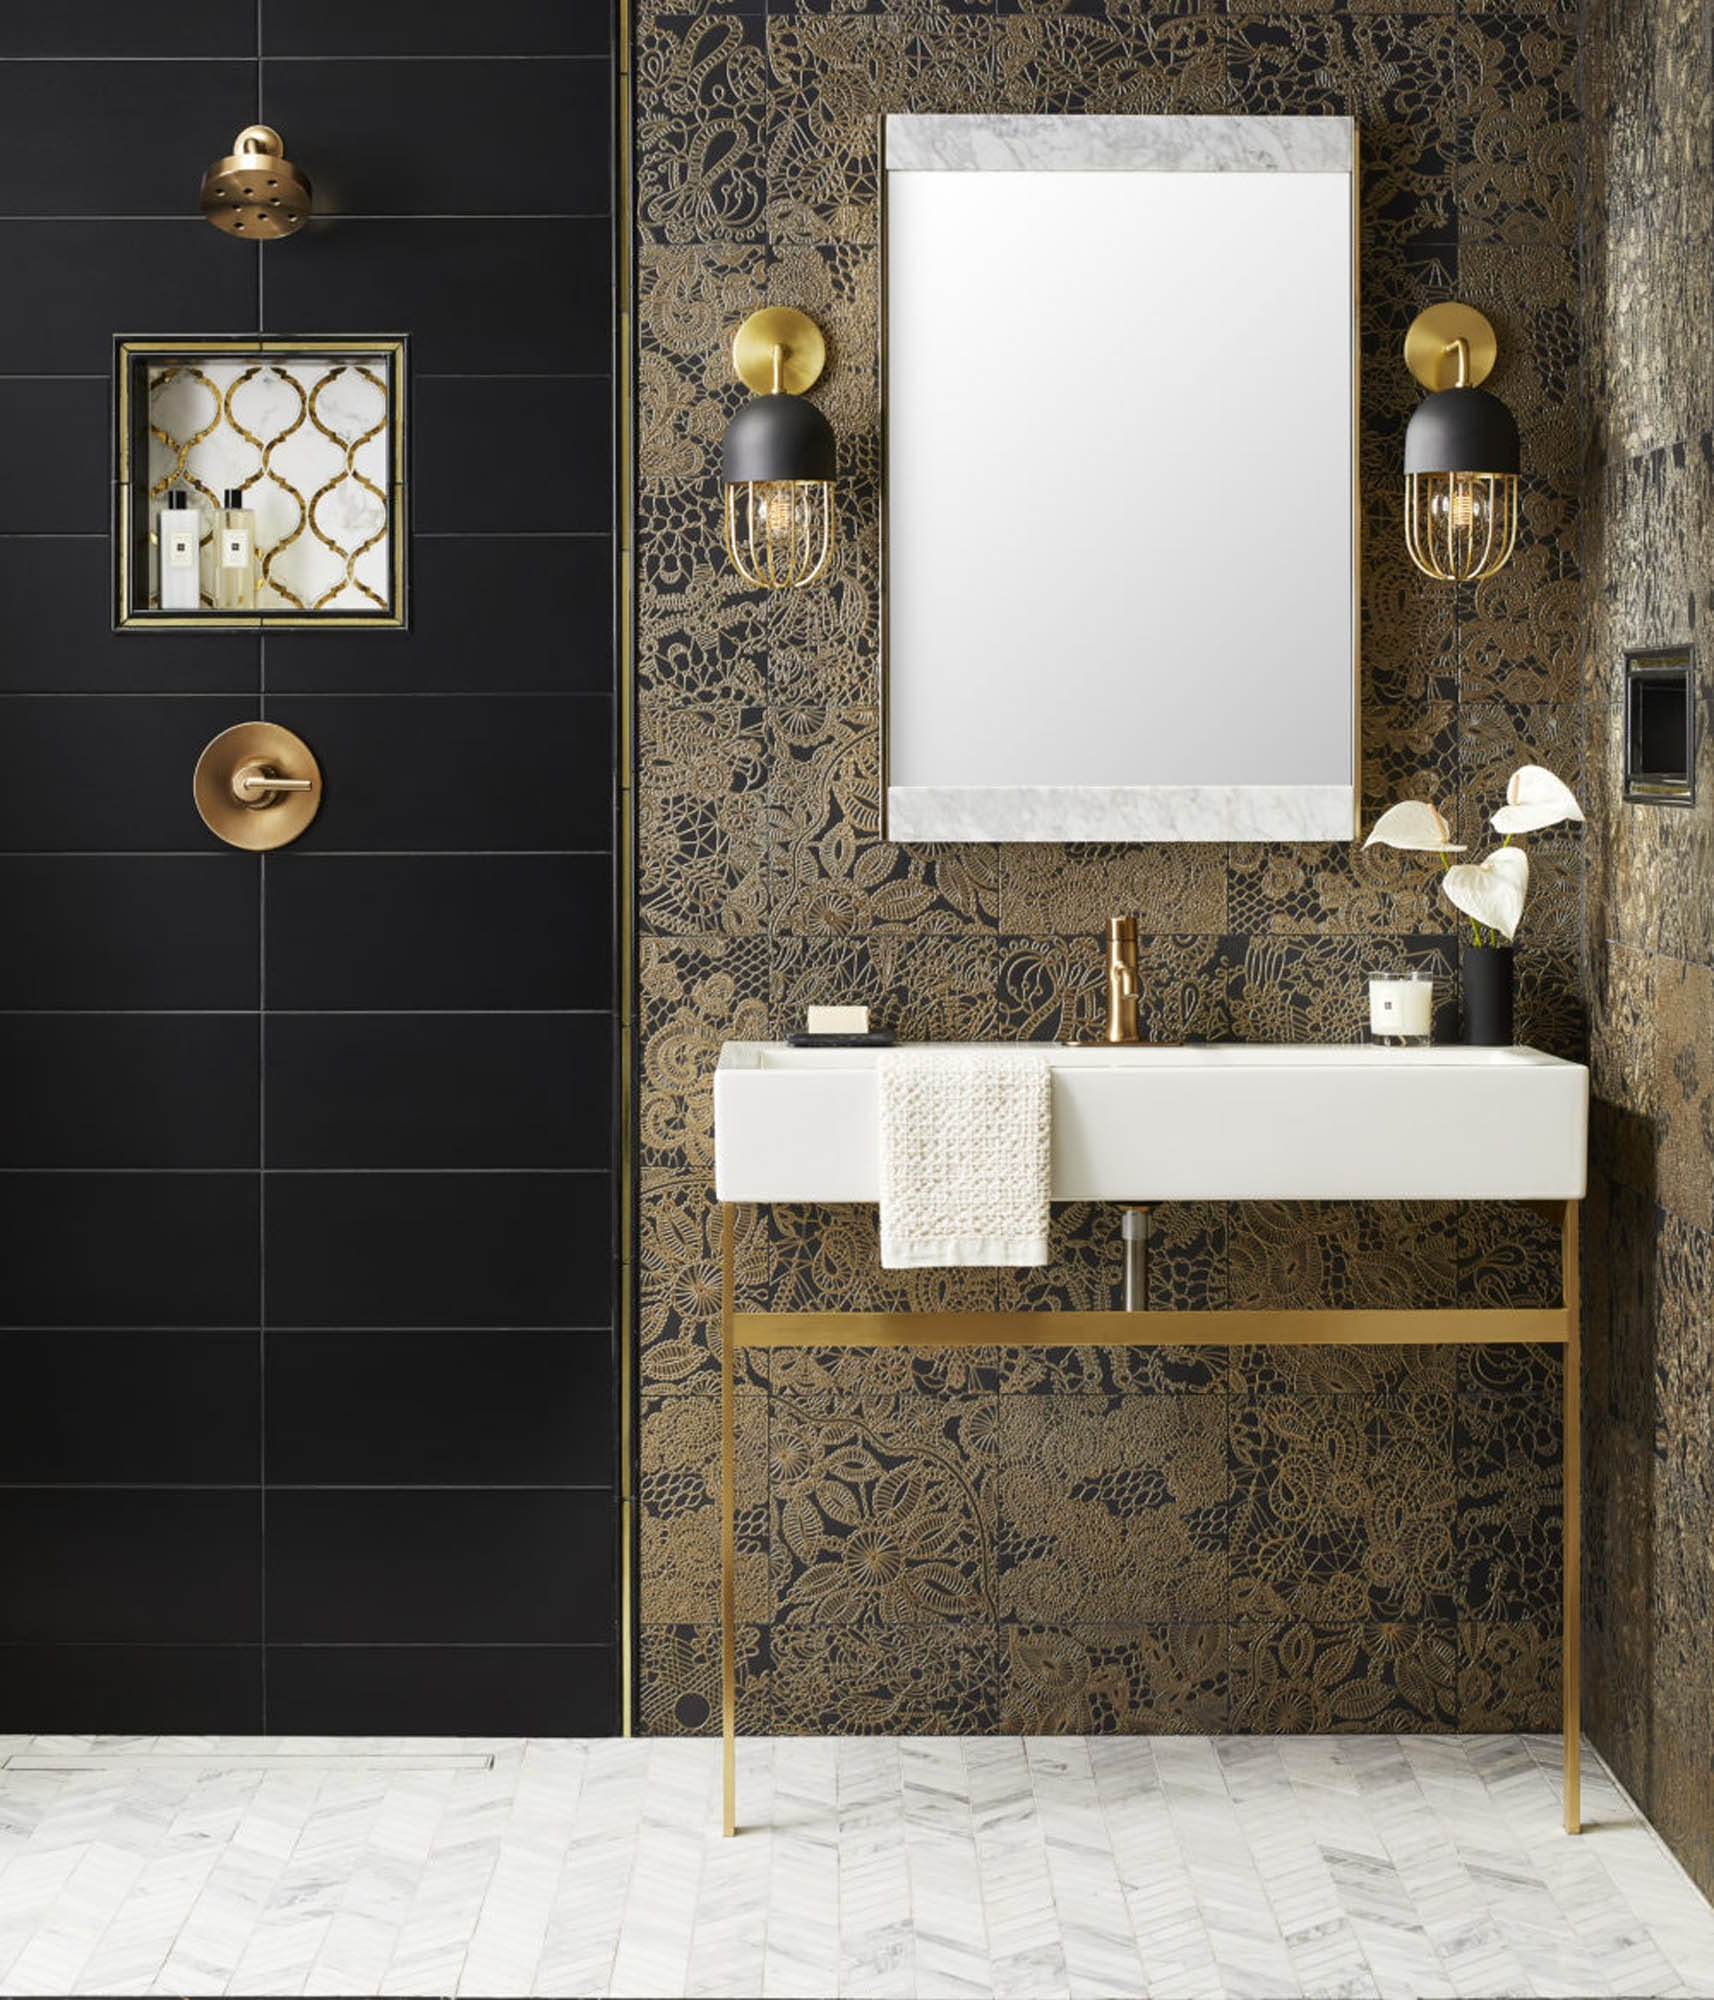 Glam black and gold bathroom